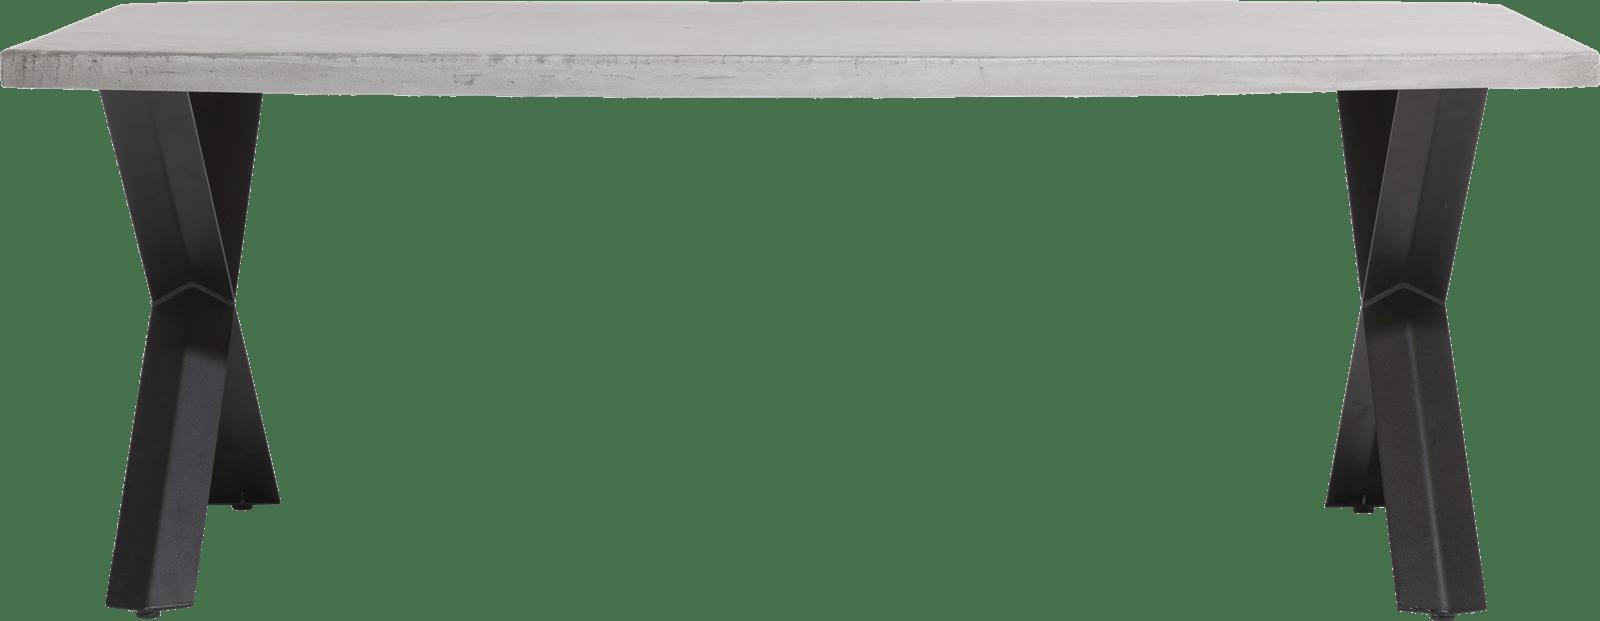 Maddox - eetkamertafel 220 x 100 cm - beton - x-poot